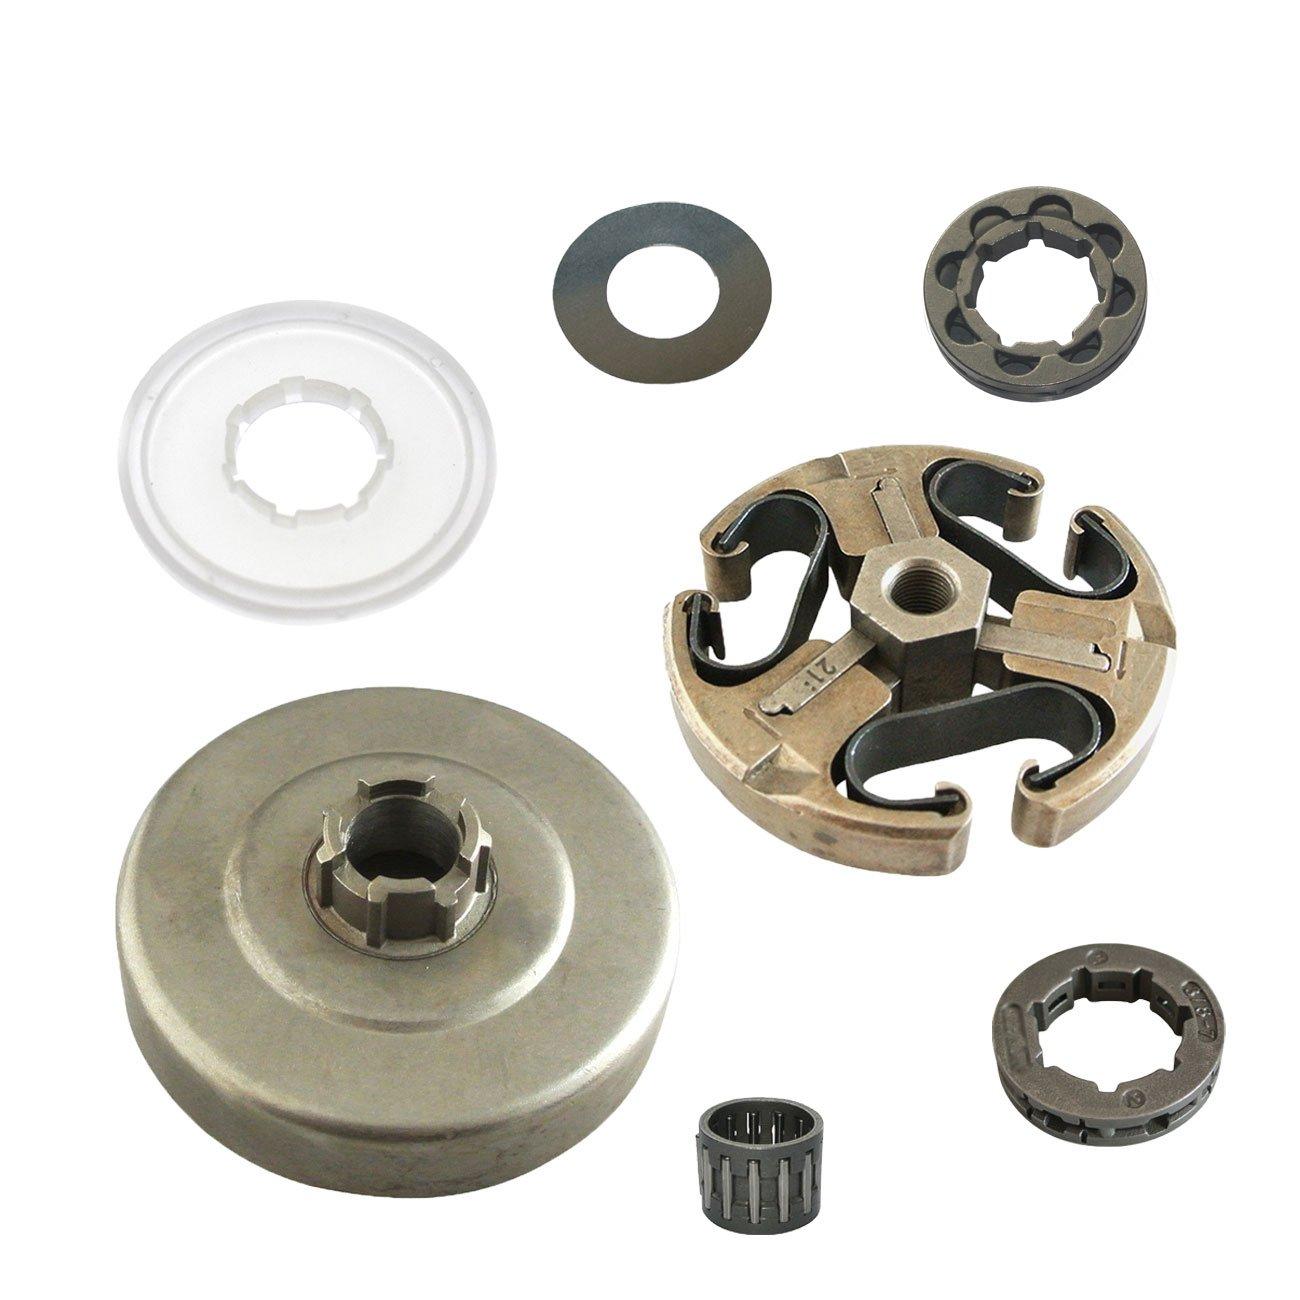 jrl 2pieza 3//8/embrague borde de rodamiento de tambor para Husqvarna 61/66/162/266/268/272/motosierra XP